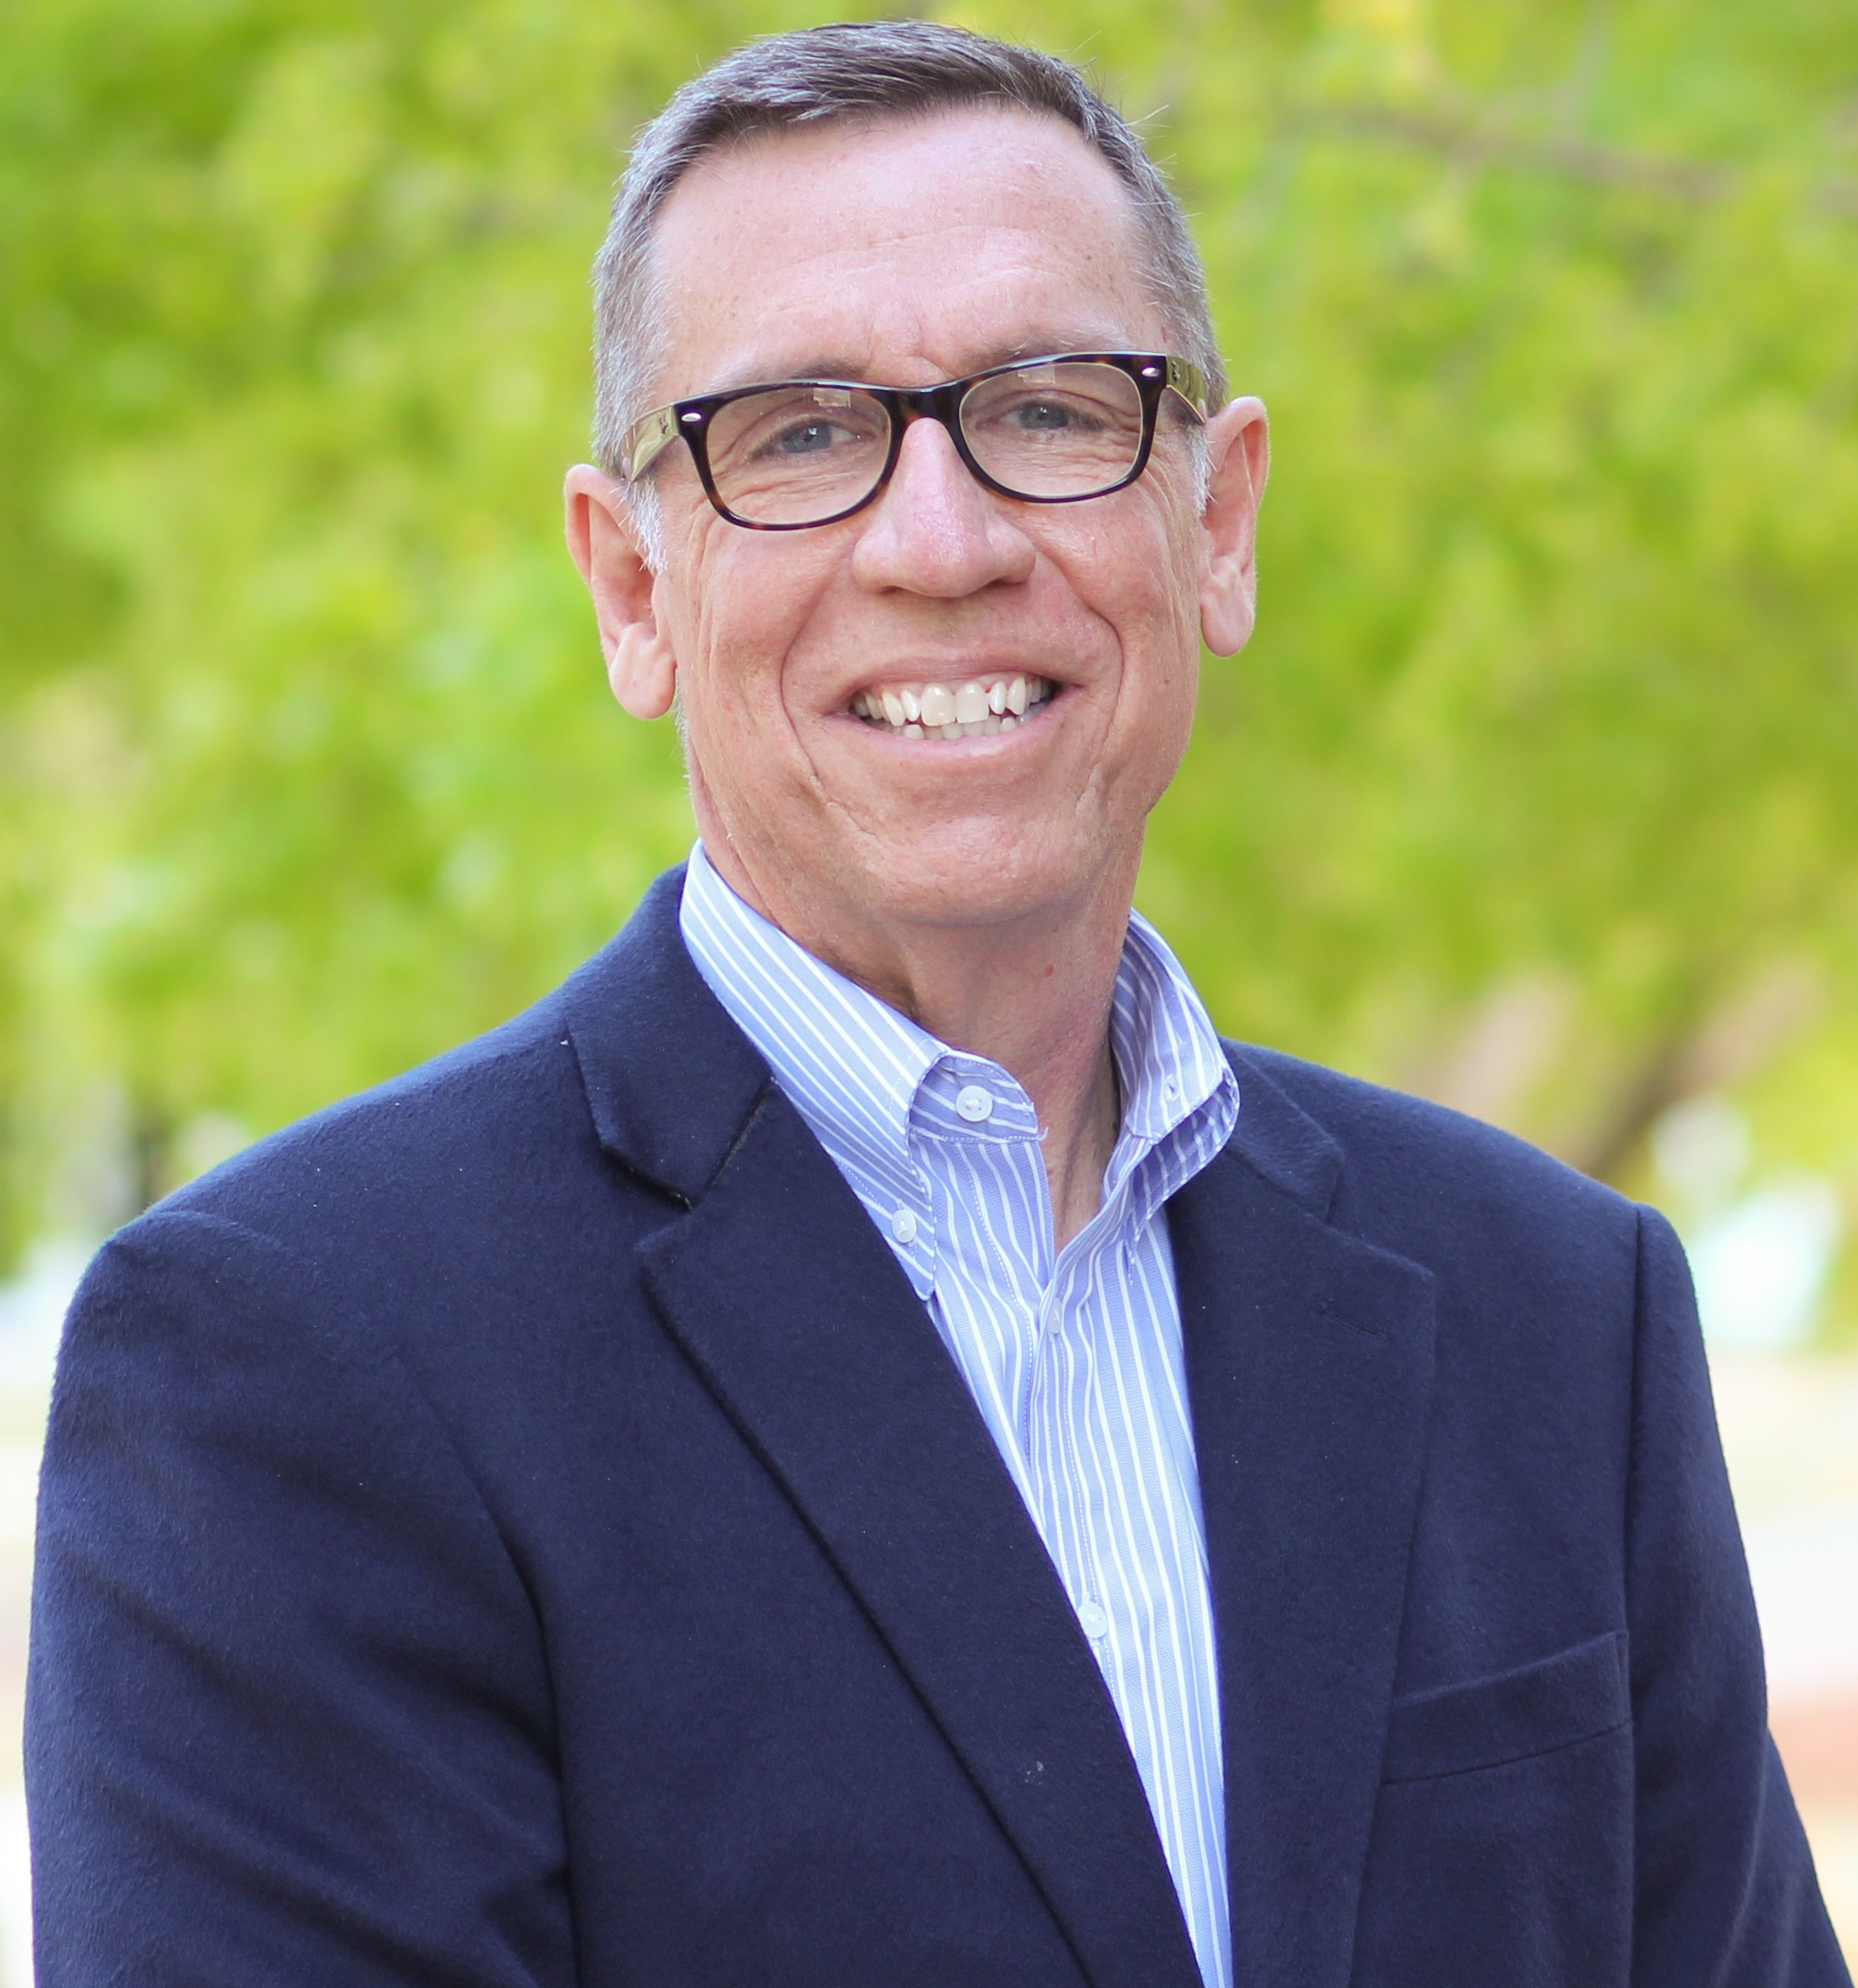 Andrew L. Urich, J.D.